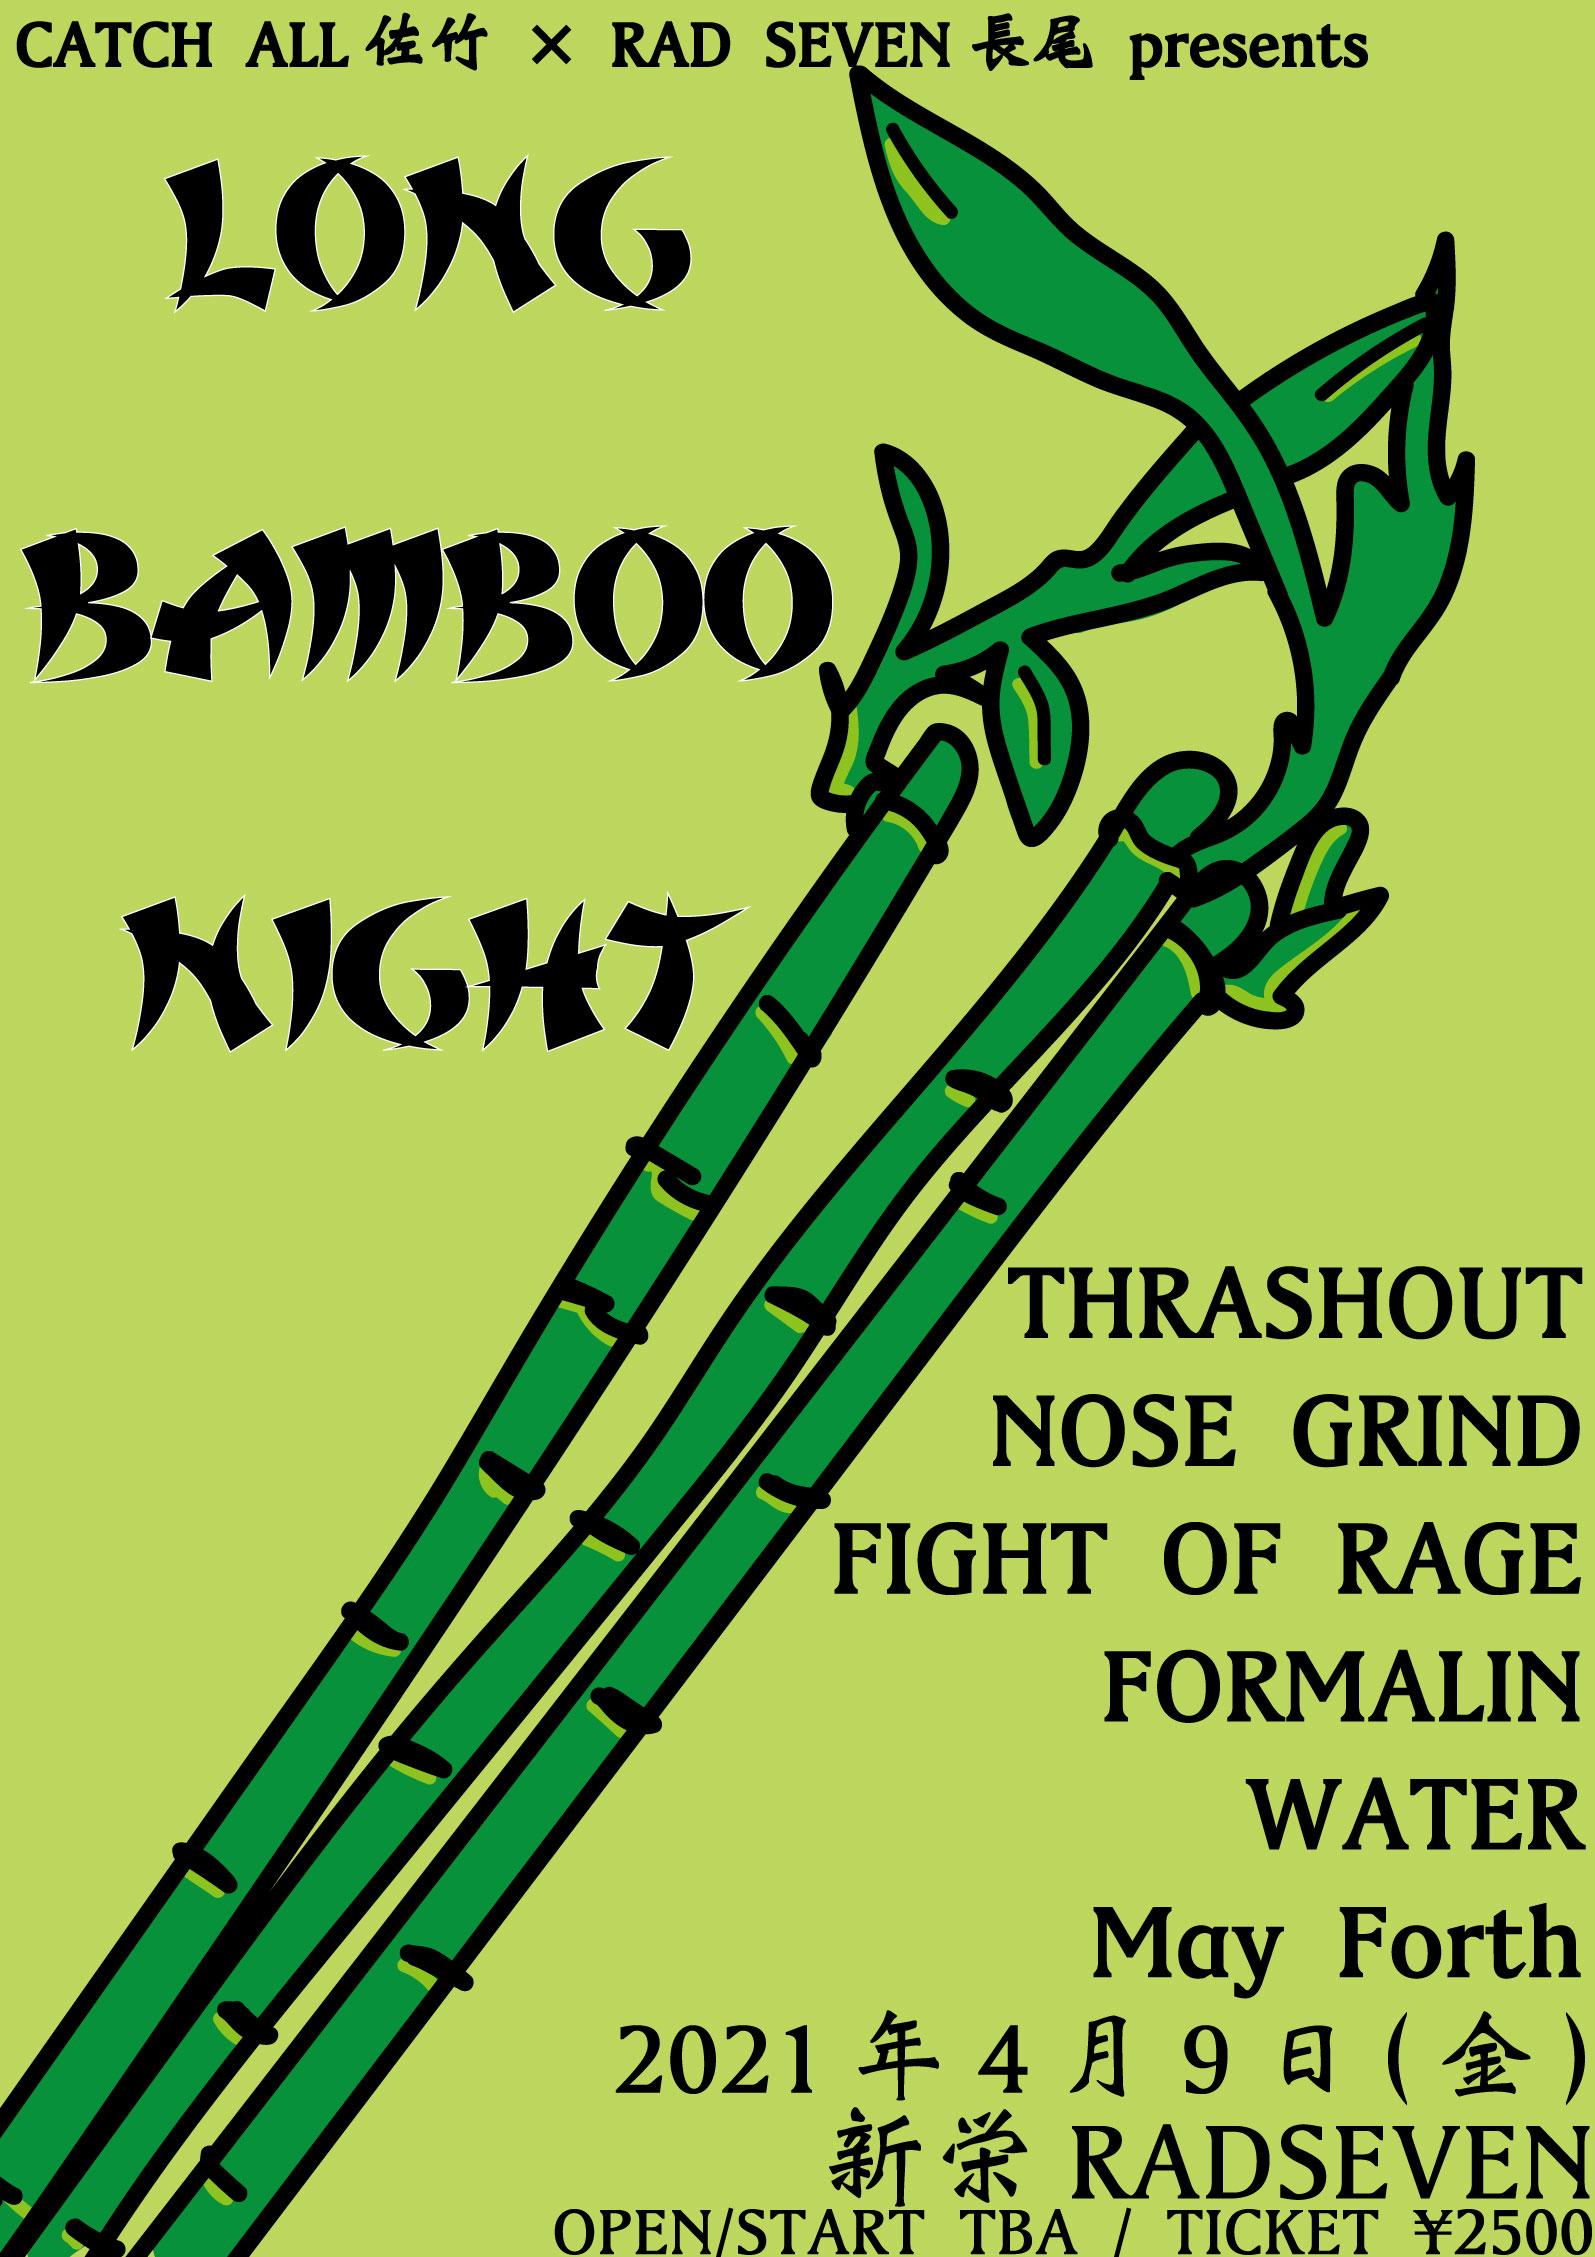 LONG BAMBOO NIGHT